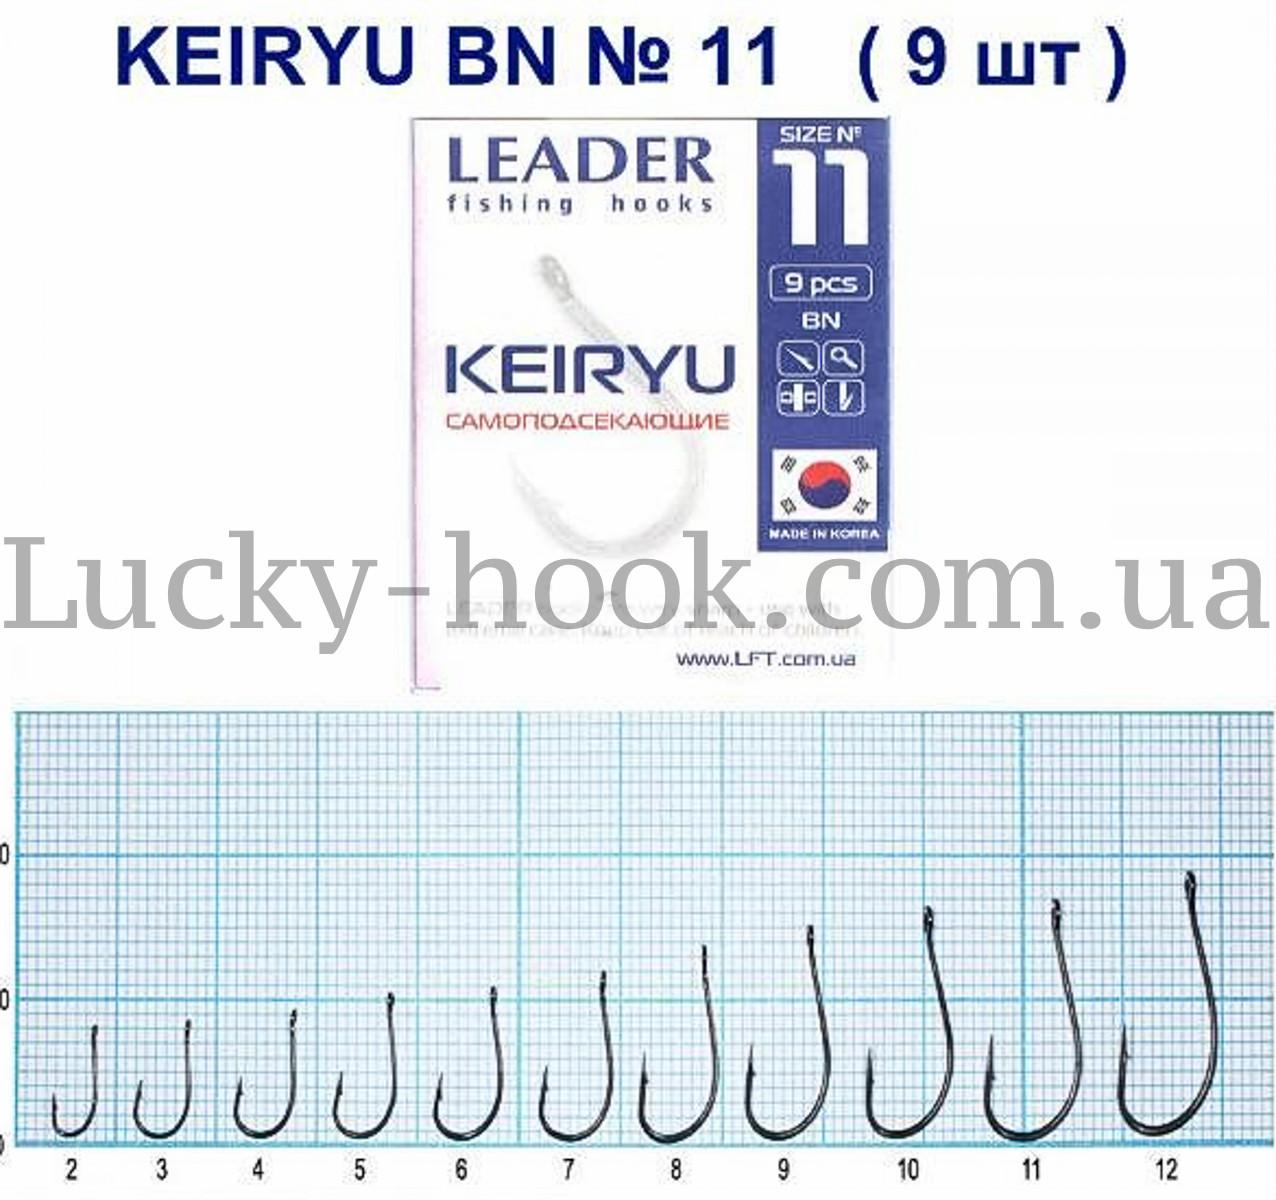 Крючок Leader KEIRYU BN самоподсекающие (карась, лещ, плотва) № 11